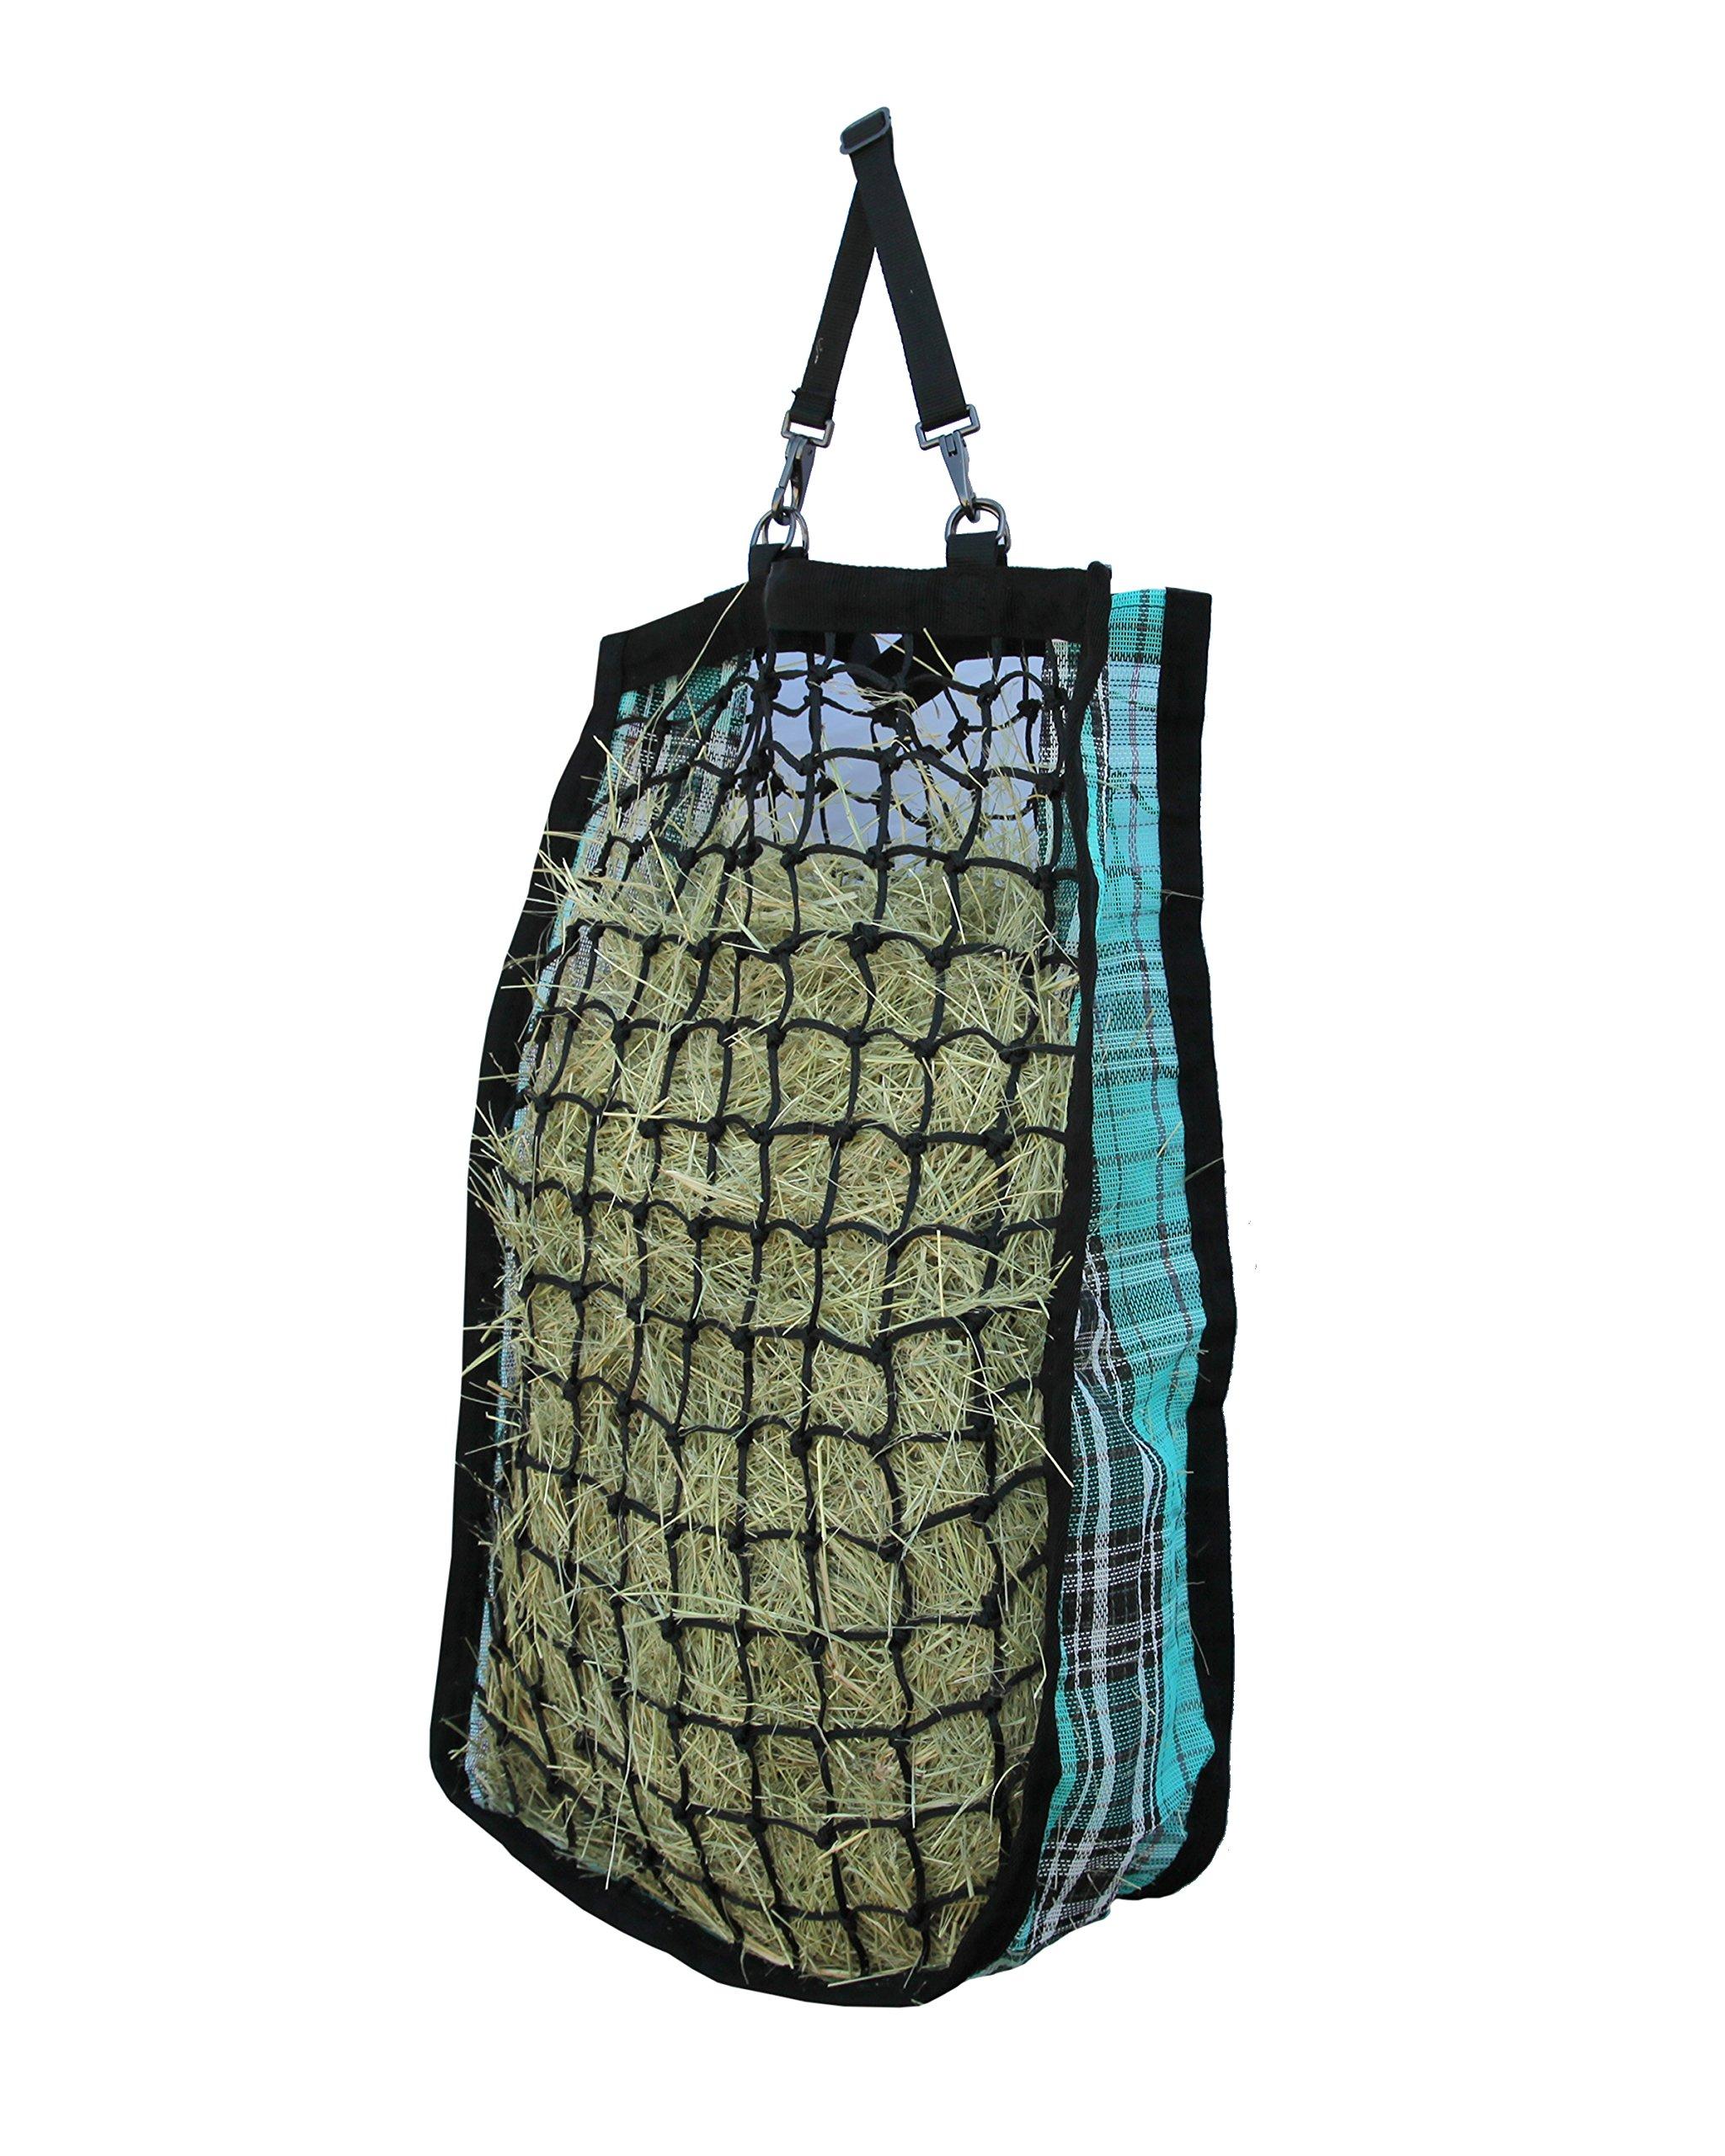 Kensington Slow Feed Hay Bag (4 Flake, Black Ice)